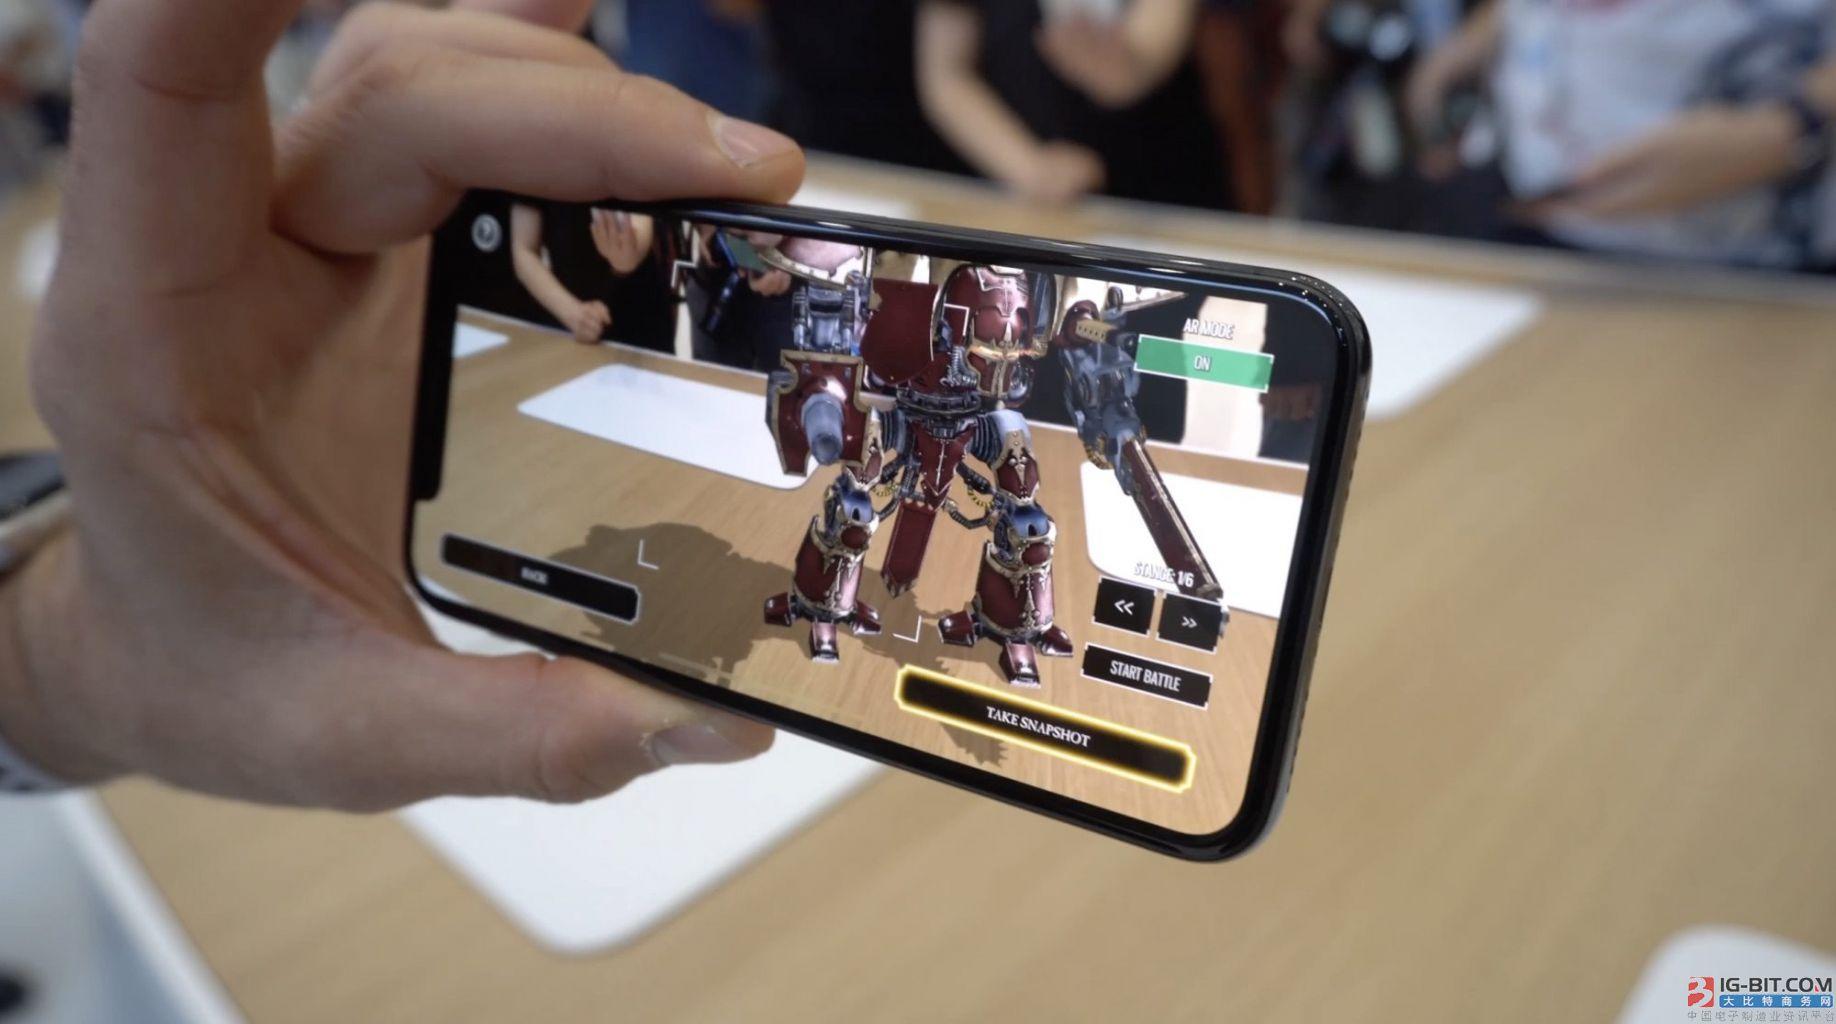 AR将成苹果吸金利器:三年增长110亿美元